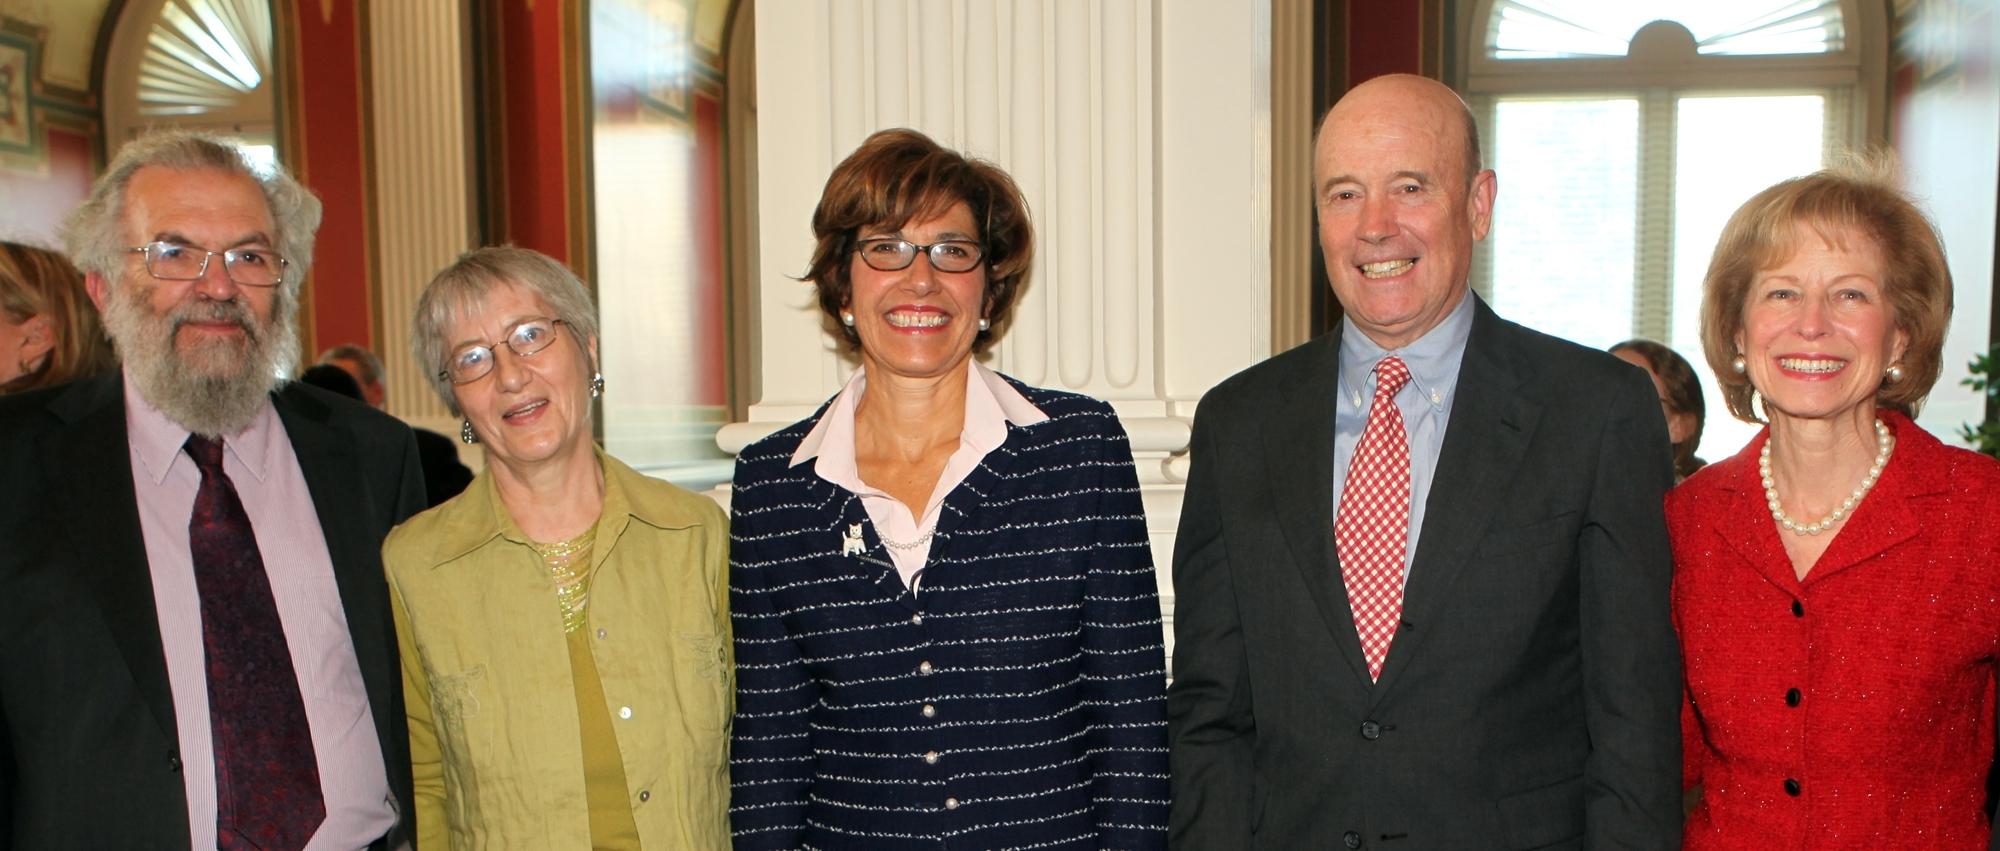 Left to right: Professor Joseph Raz, Dr. Penolope Bulloch, Roberta I. Shaffer, Frederic R. Kellogg and Molly S. Kellogg (Library of Congress photos /Abby Brack)